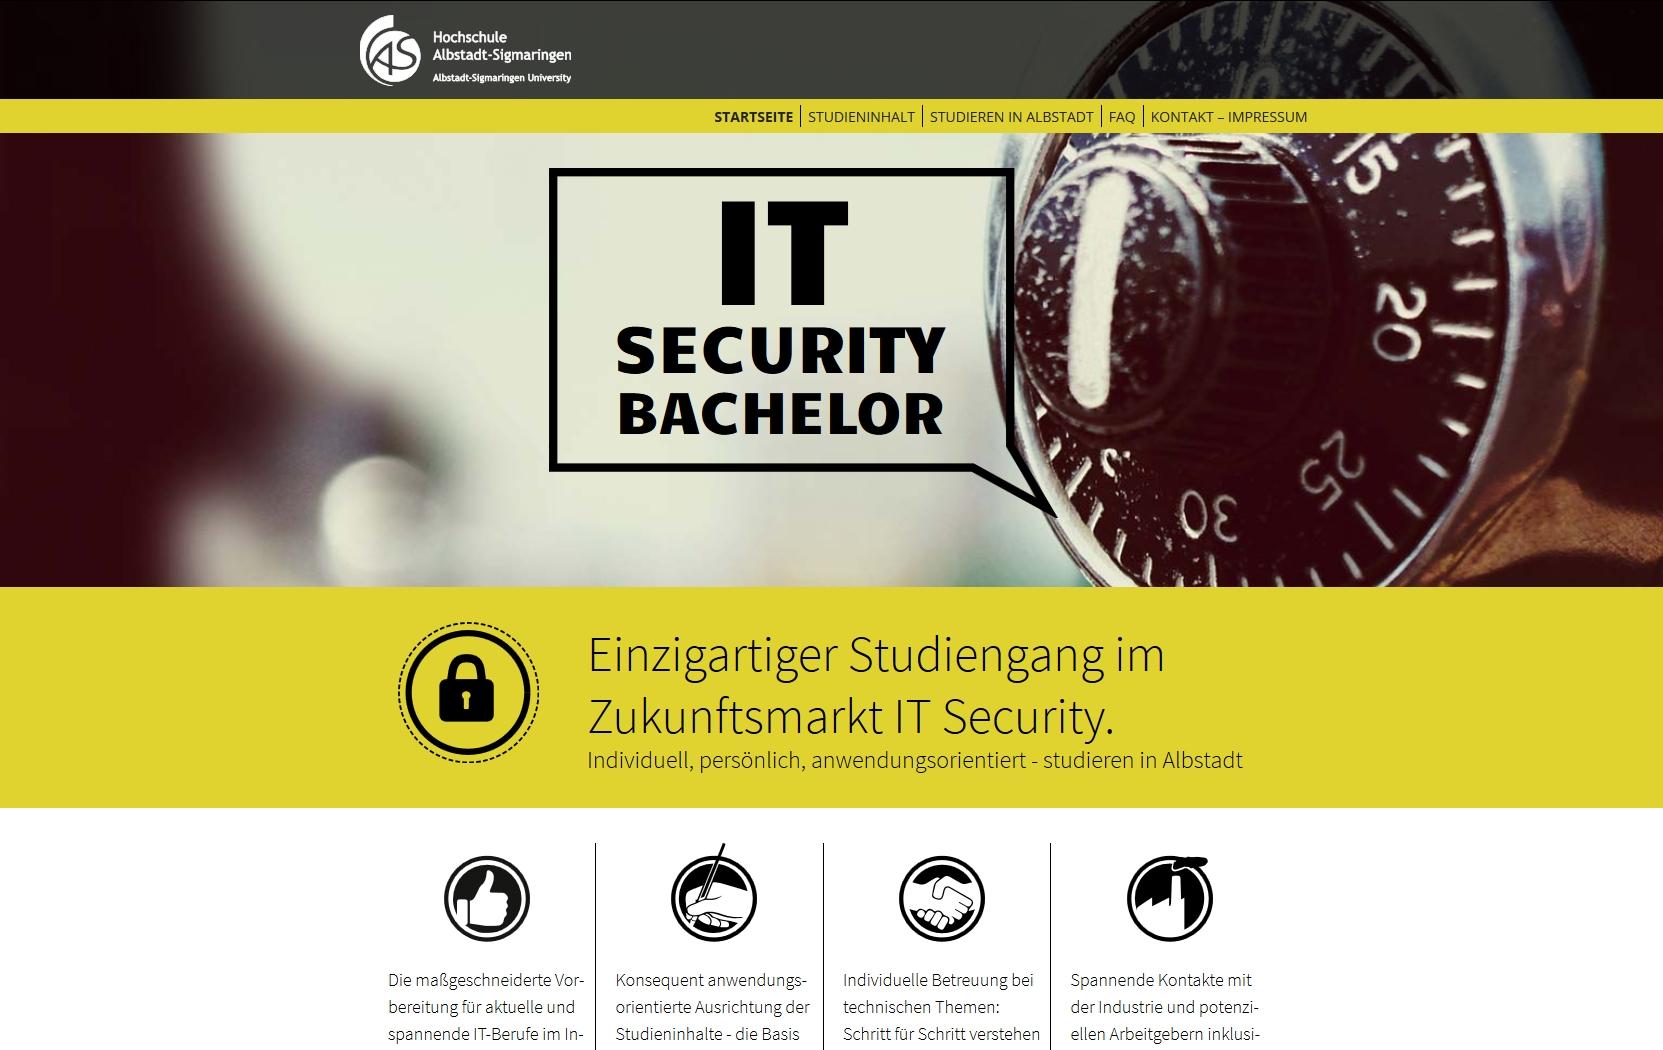 Einzigartiger Studiengang im Zukunftsfeld IT Security